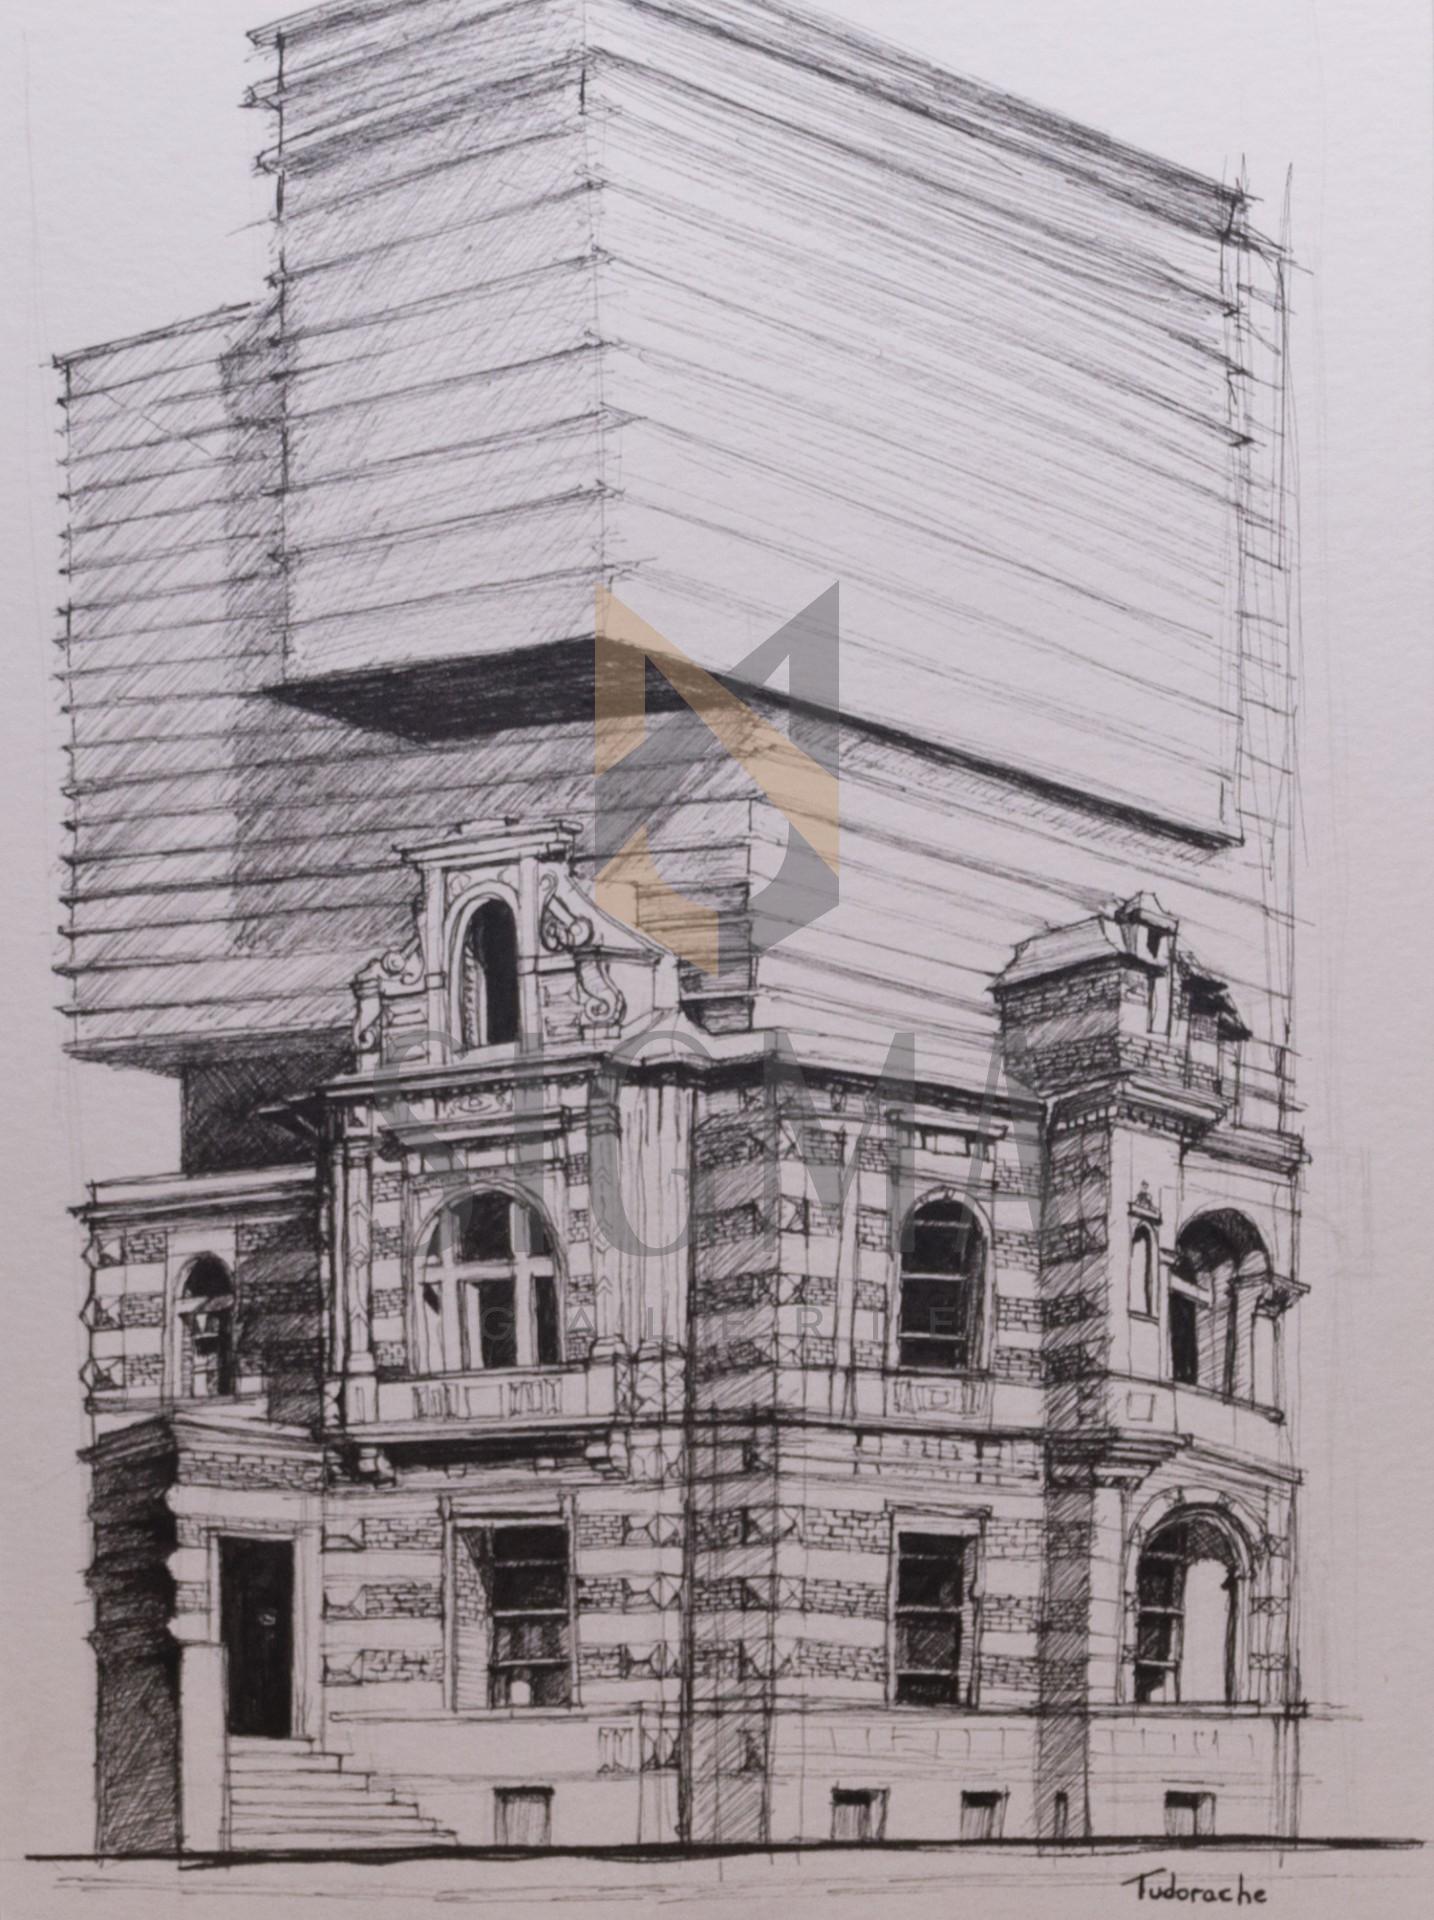 Tablou, George Daniel Tudorache - Uniunea Arhitectilor -  tus, 30x21 cm